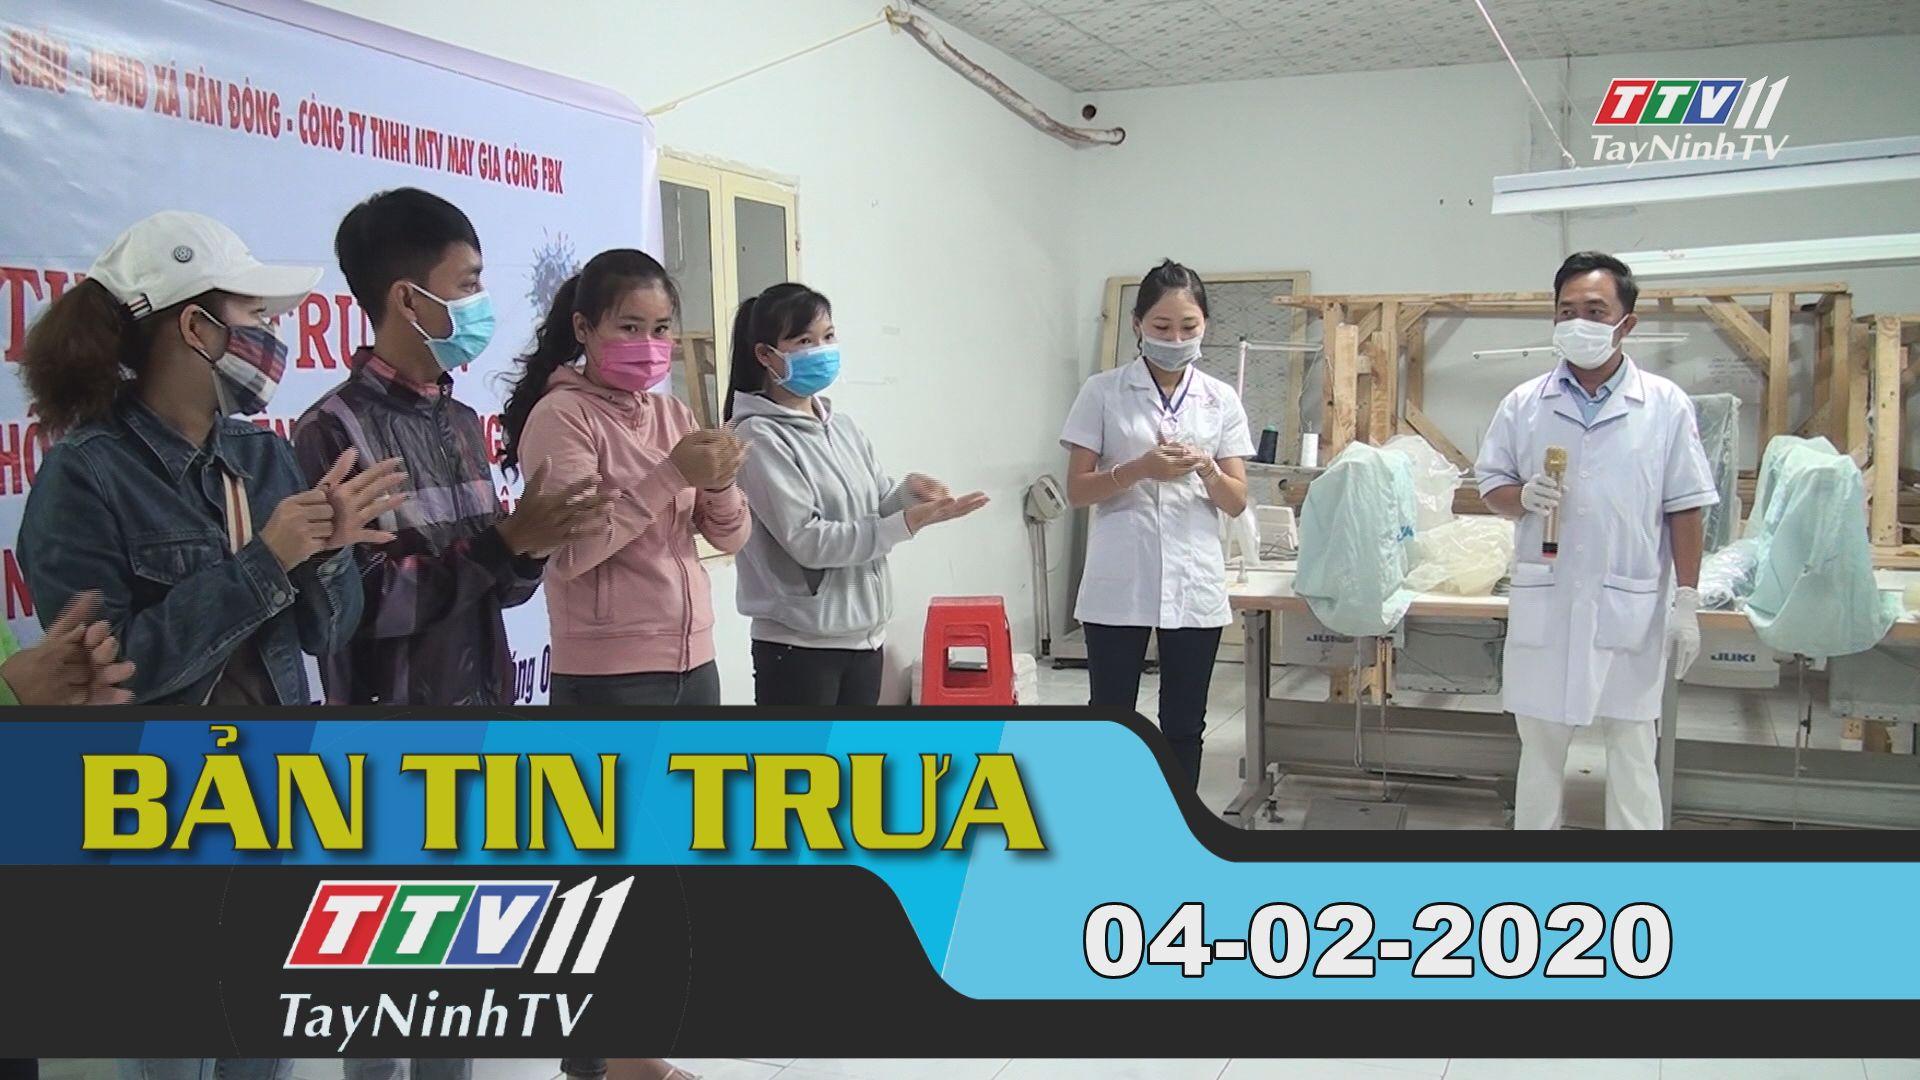 Bản tin trưa 04-02-2020 | Tin tức hôm nay | TayNinhTV